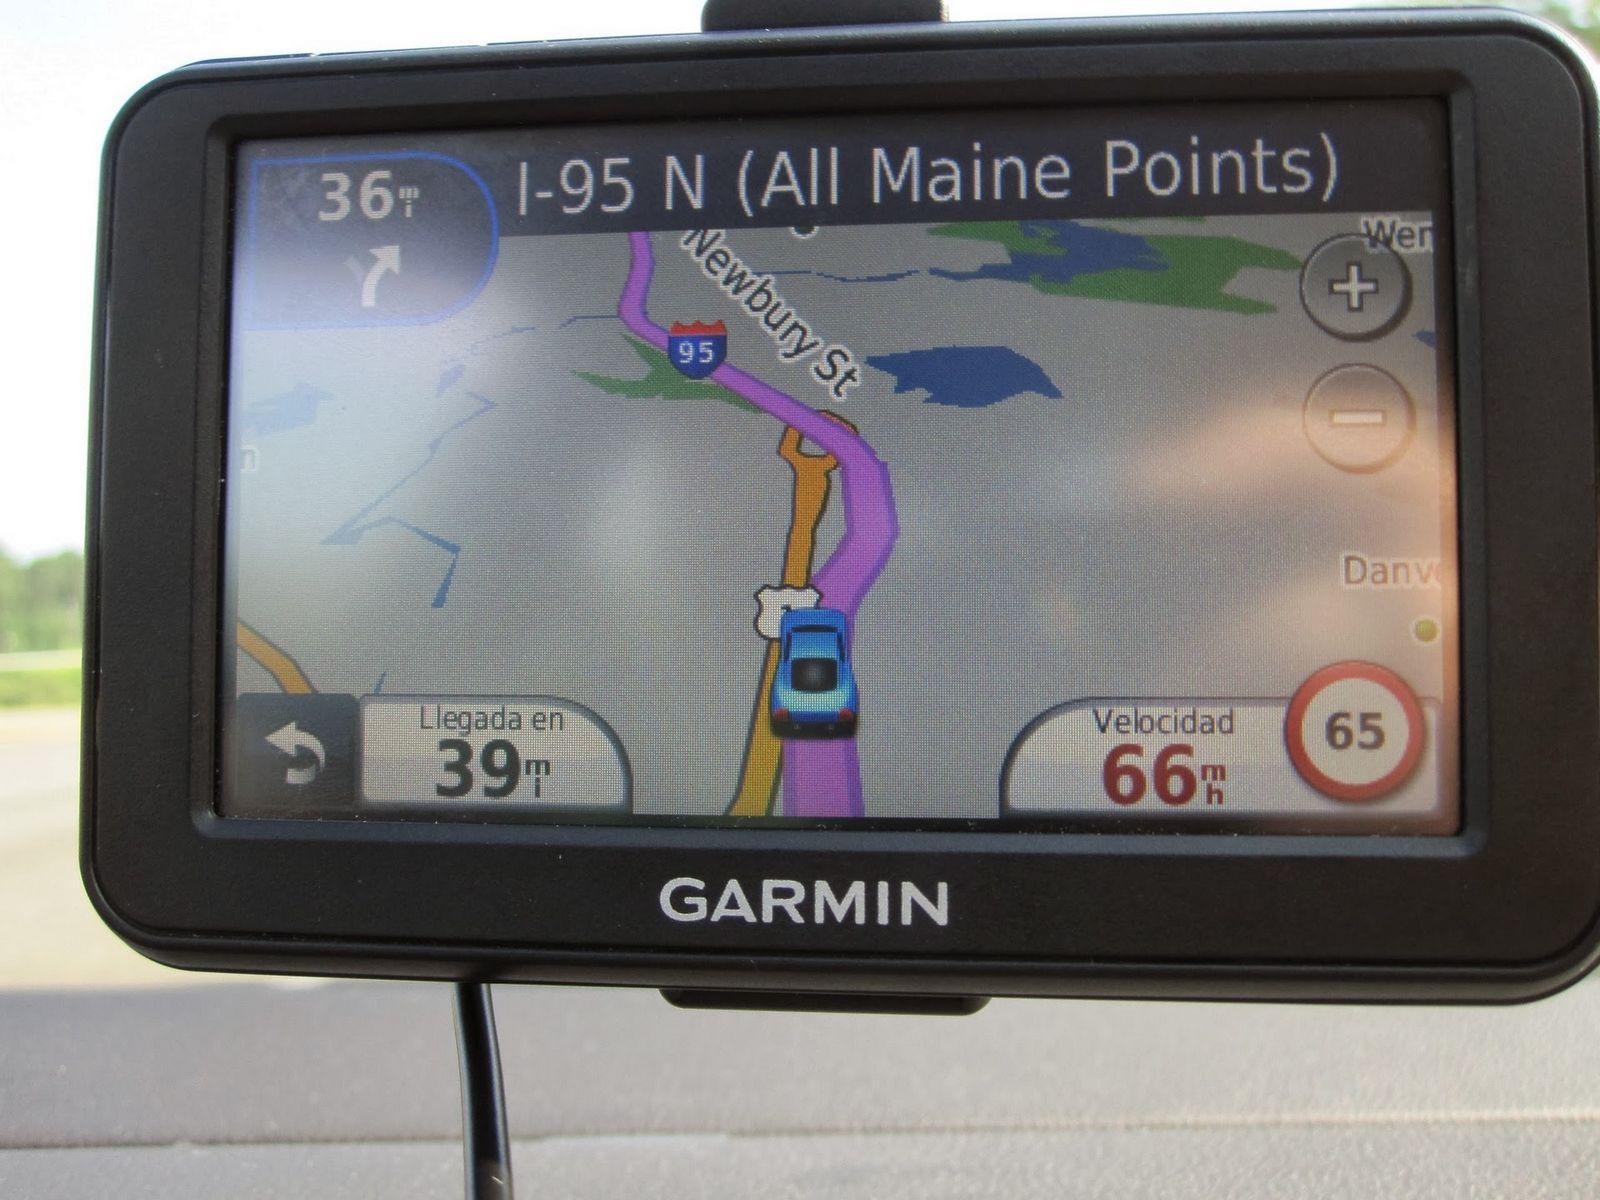 Primeras millas, ¡rumbo a Maine!